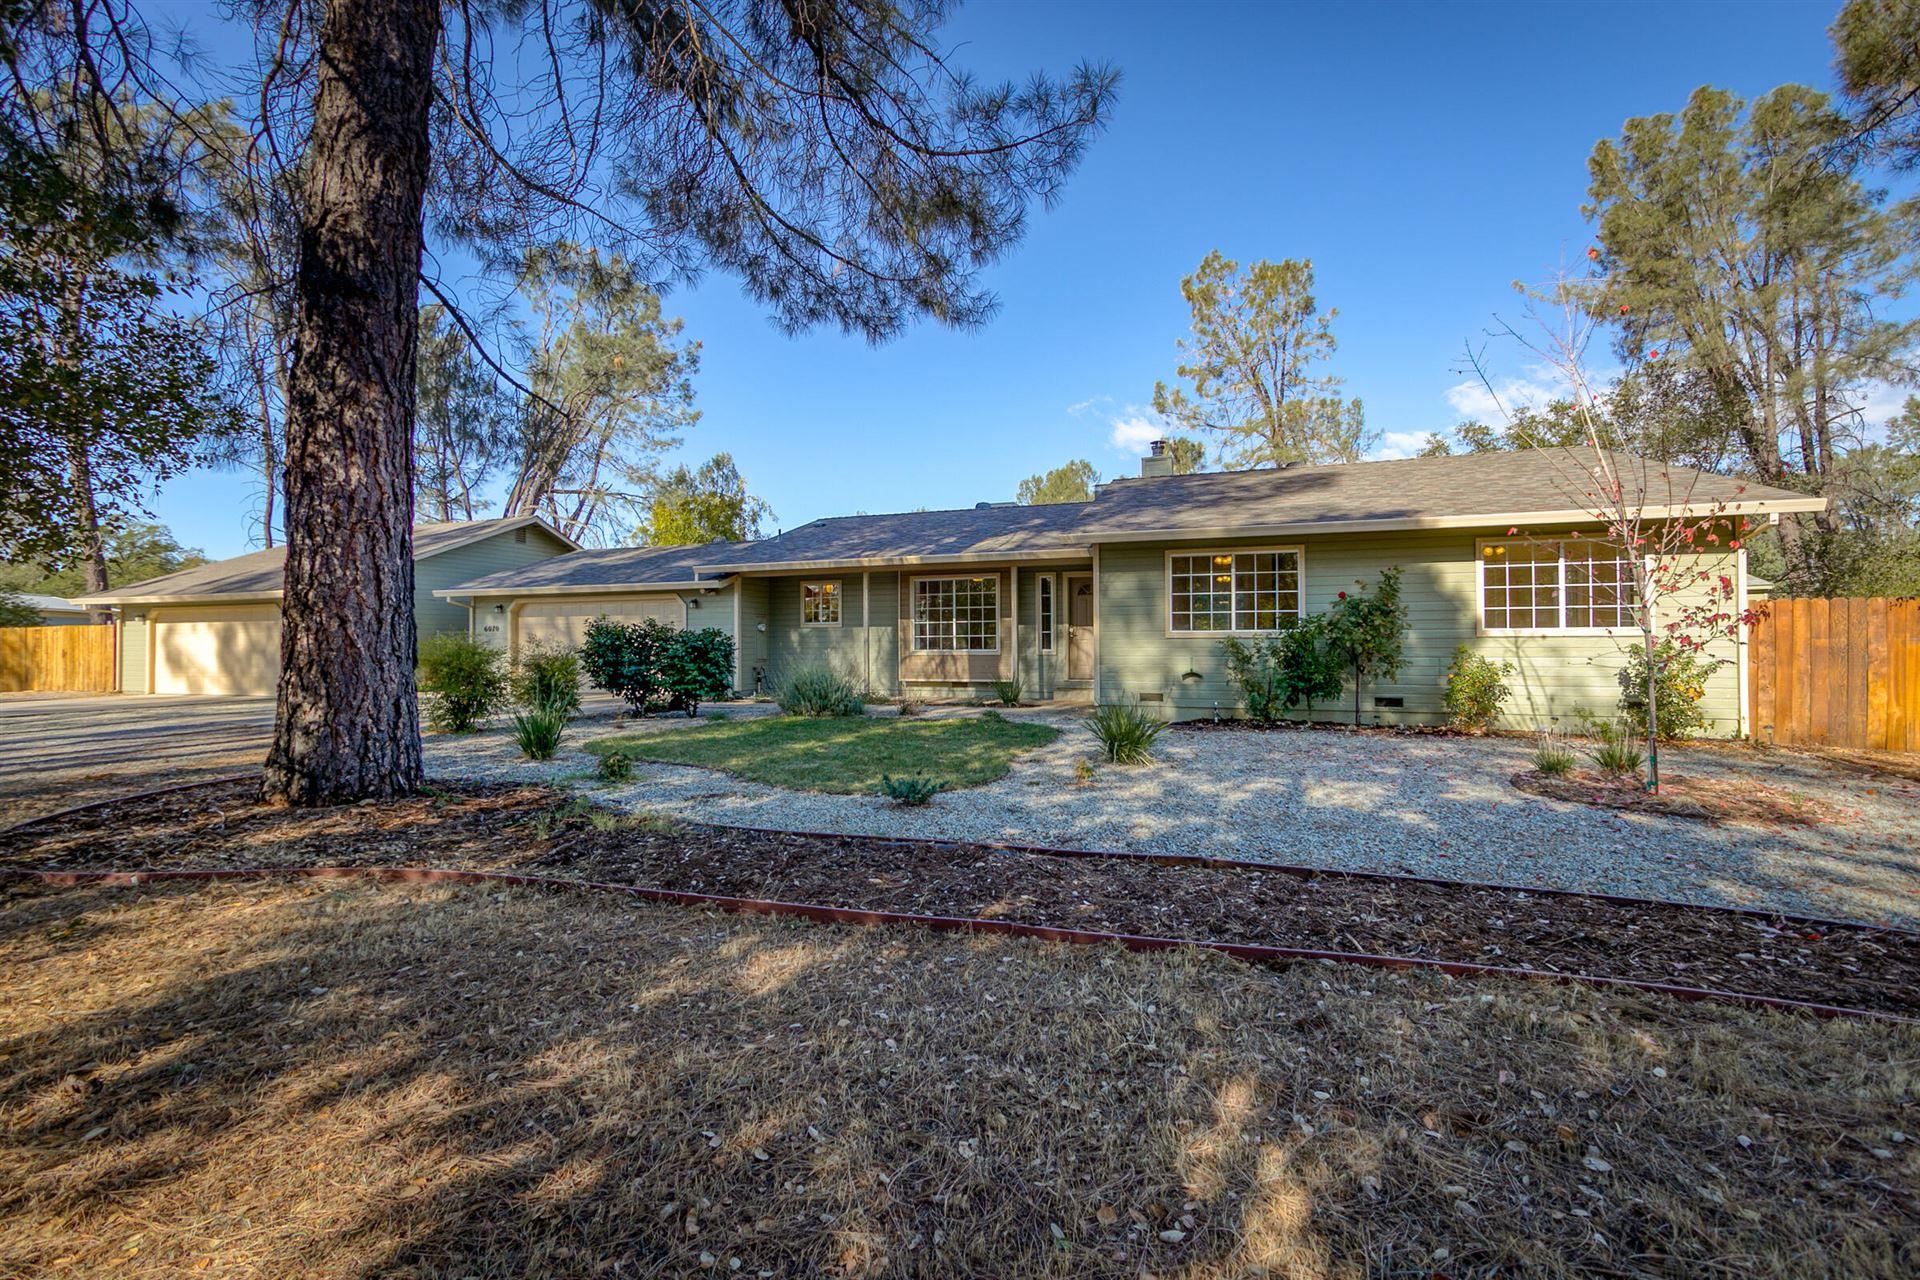 Photo of 6070 Pepperwood Ln, Anderson, CA 96007 (MLS # 21-4870)